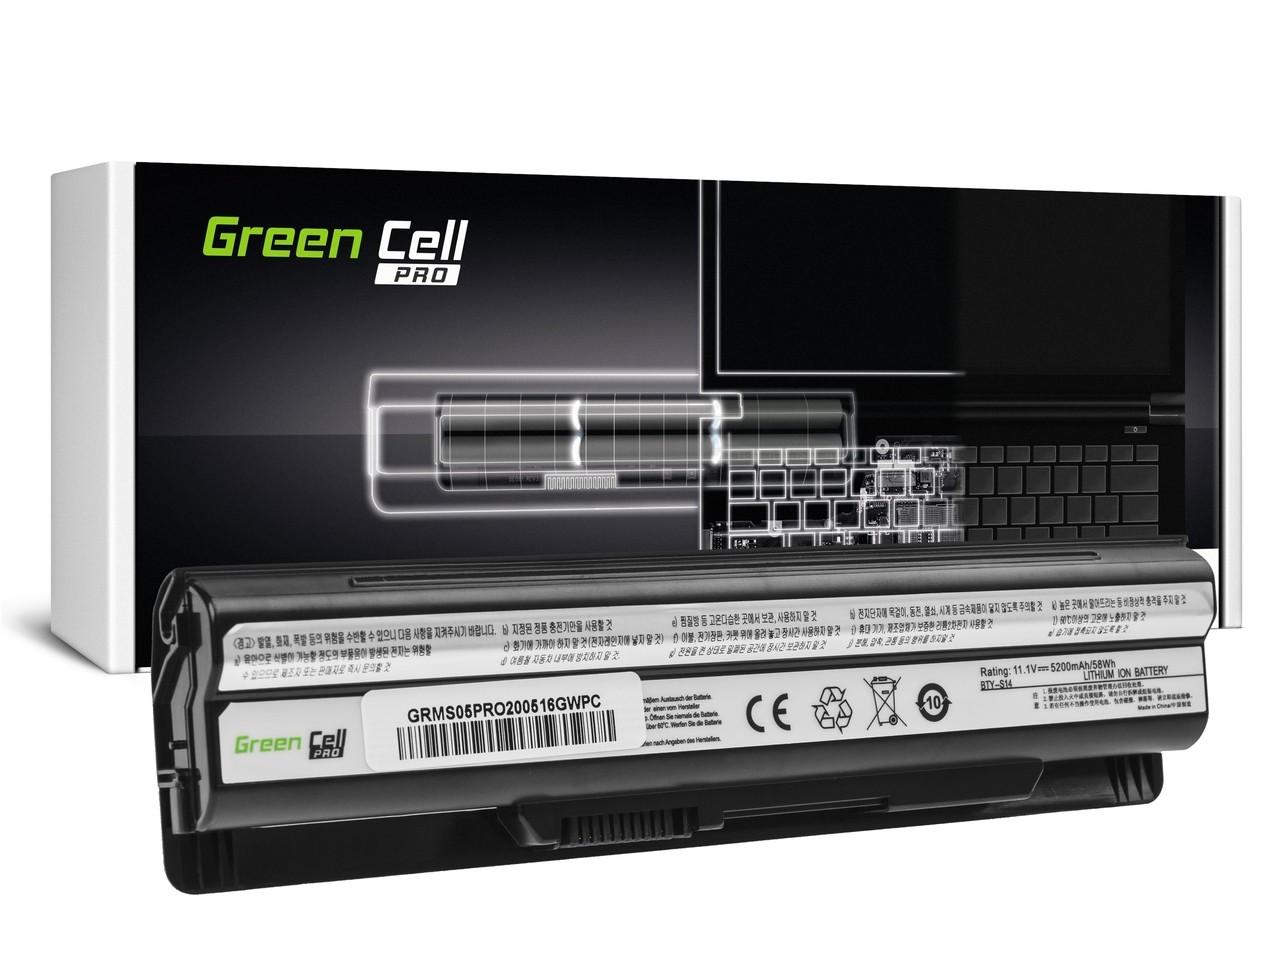 Bärbar dator Batteri PRO BTY-S14 BTY-S15 för MSI CR650 CX650 FX400 FX600 FX700 GE60 GE70 GP60 GP70 GE620